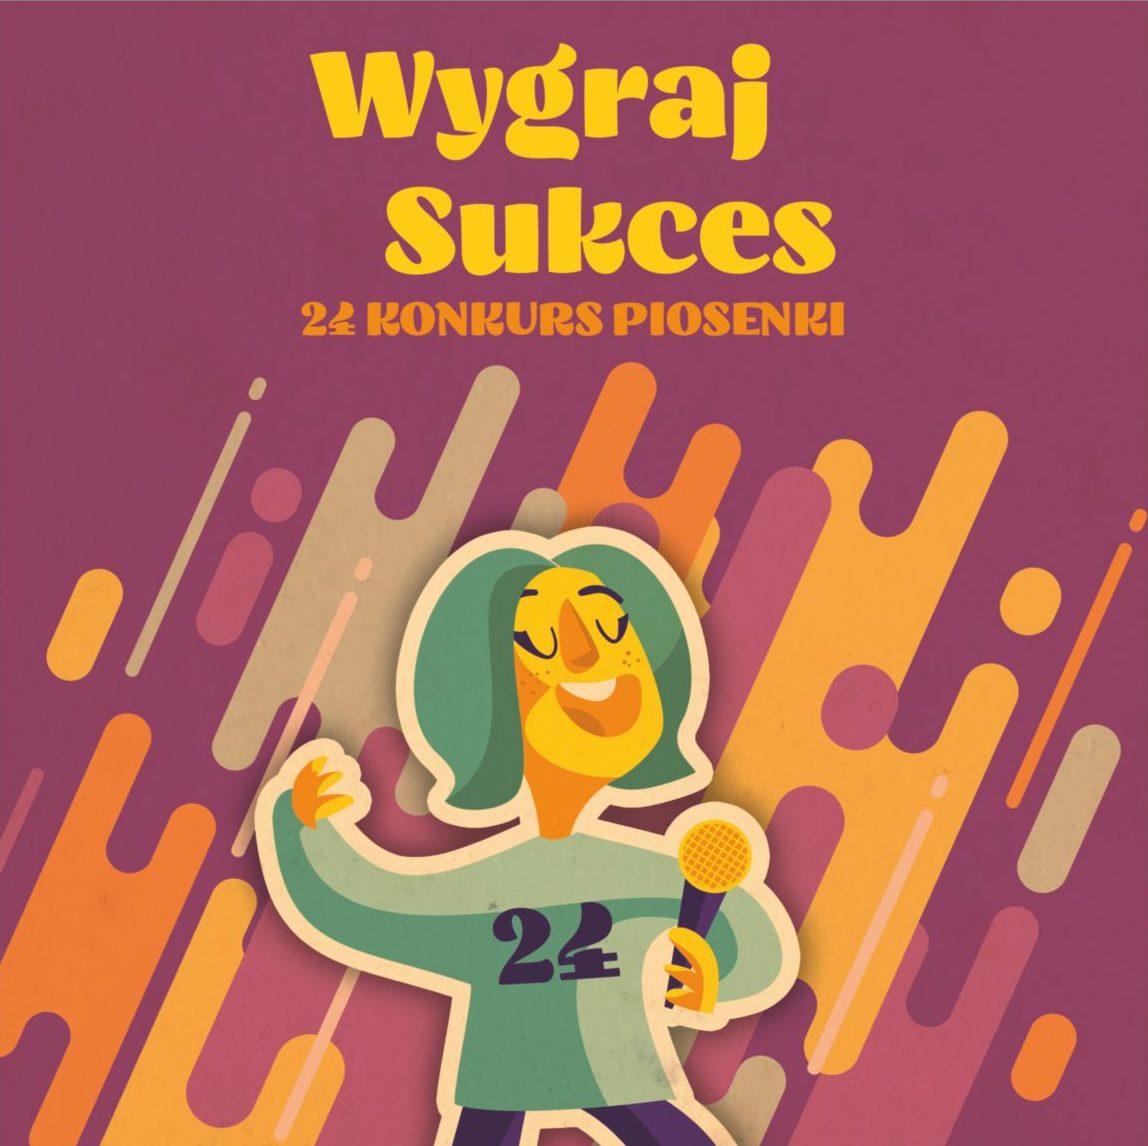 24-Wygraj-Sukces-reg